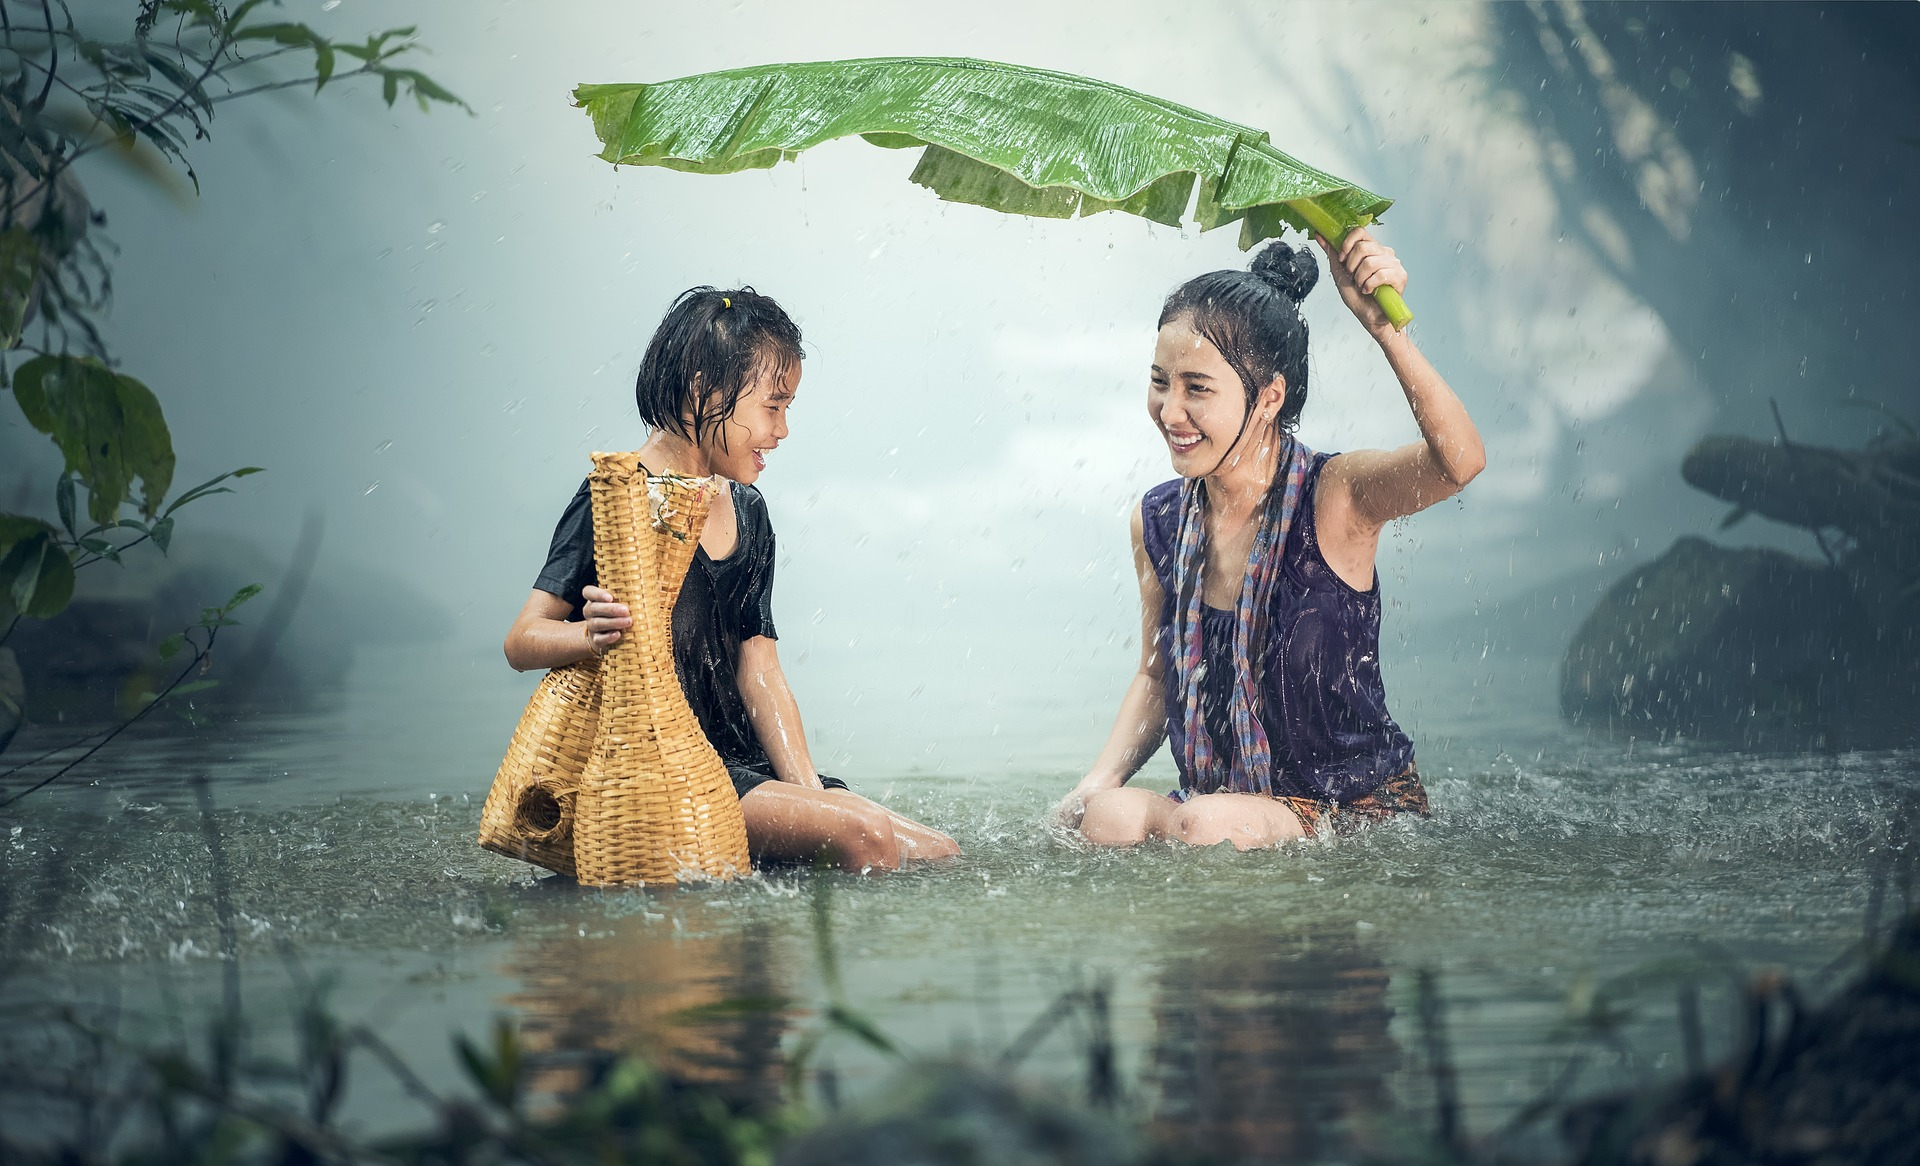 Taking Bath in Running Water, Activity, Bath, Flow, Girl, HQ Photo